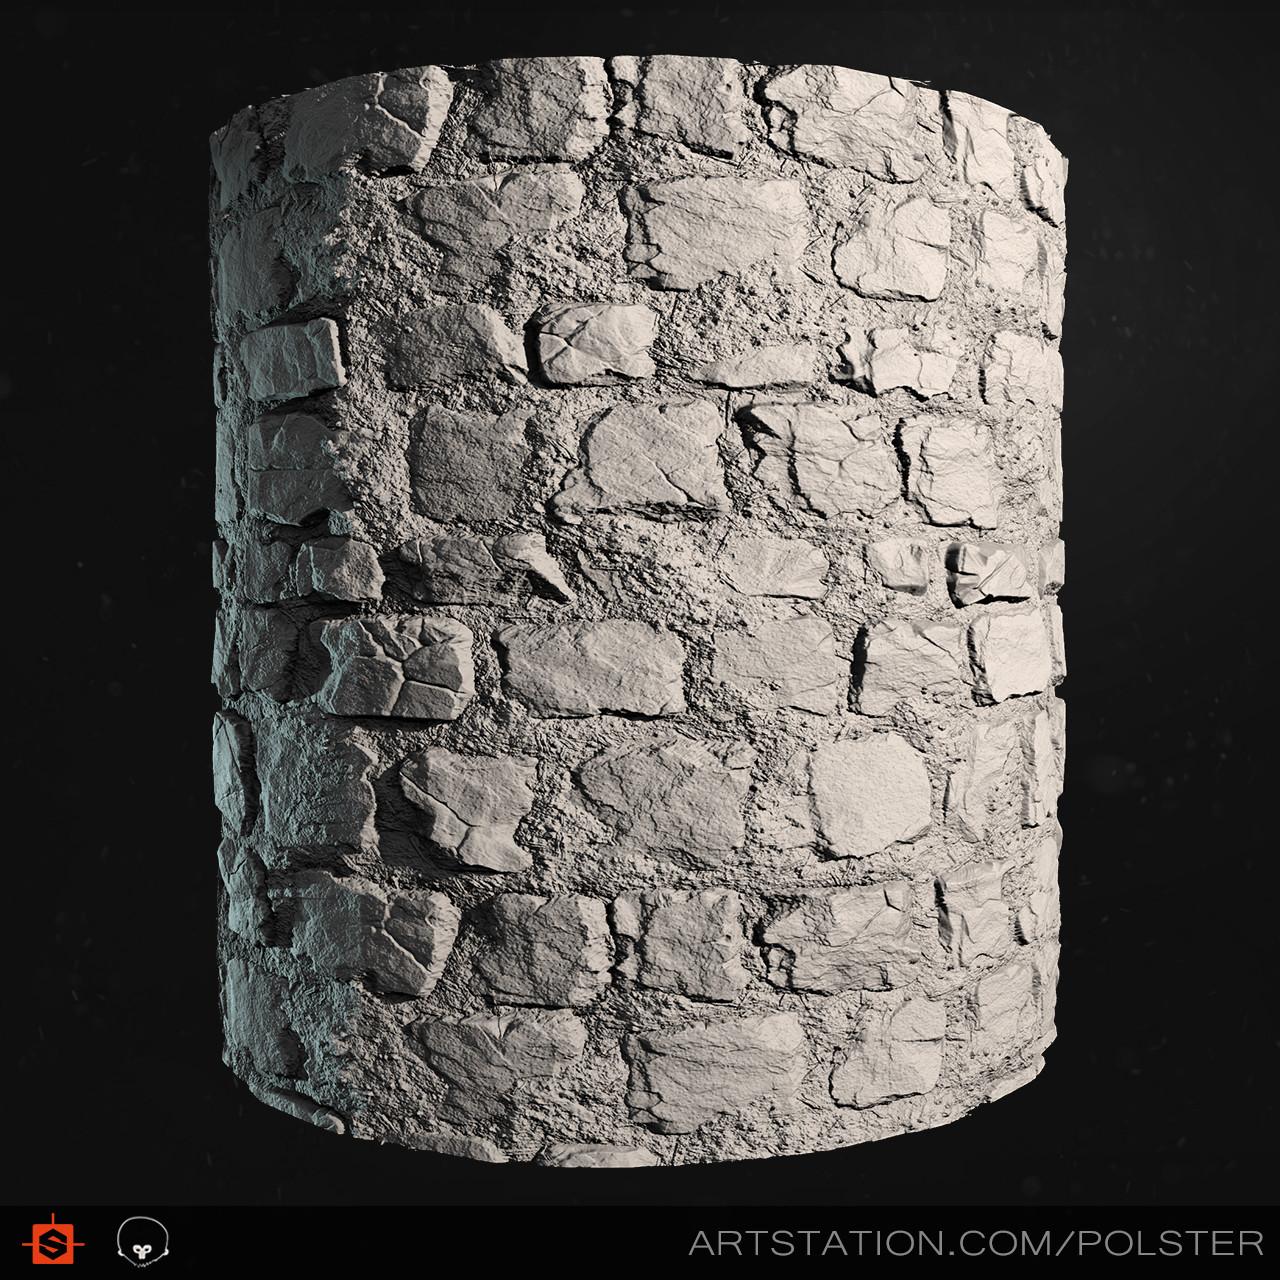 Stefan polster rough cobblestone cyl